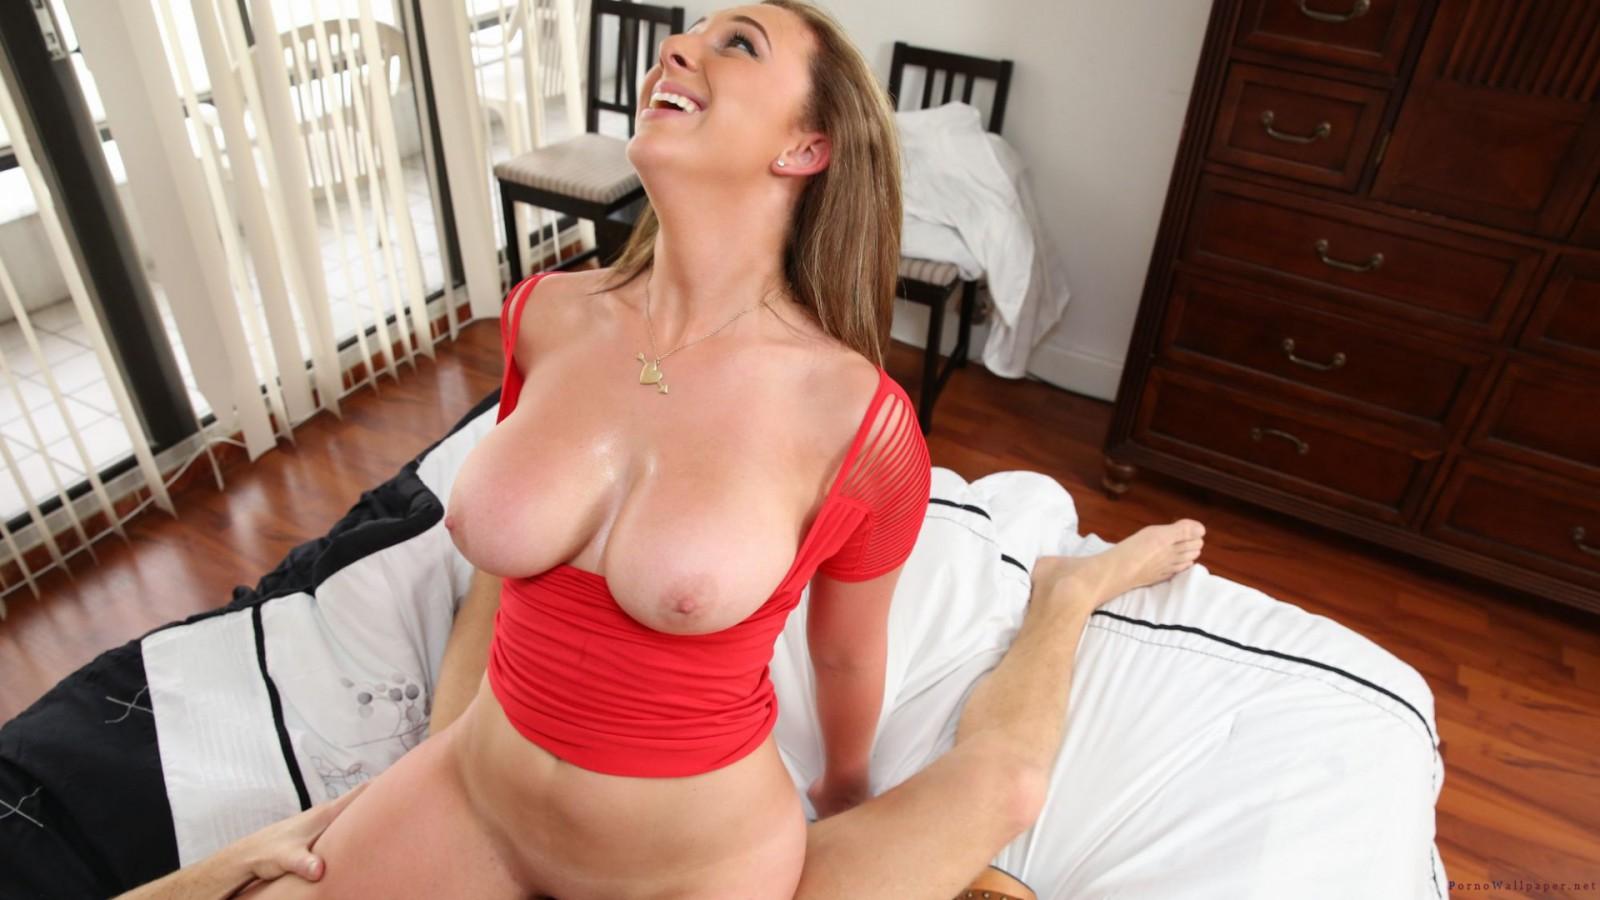 Cfnm bondage sex slave video